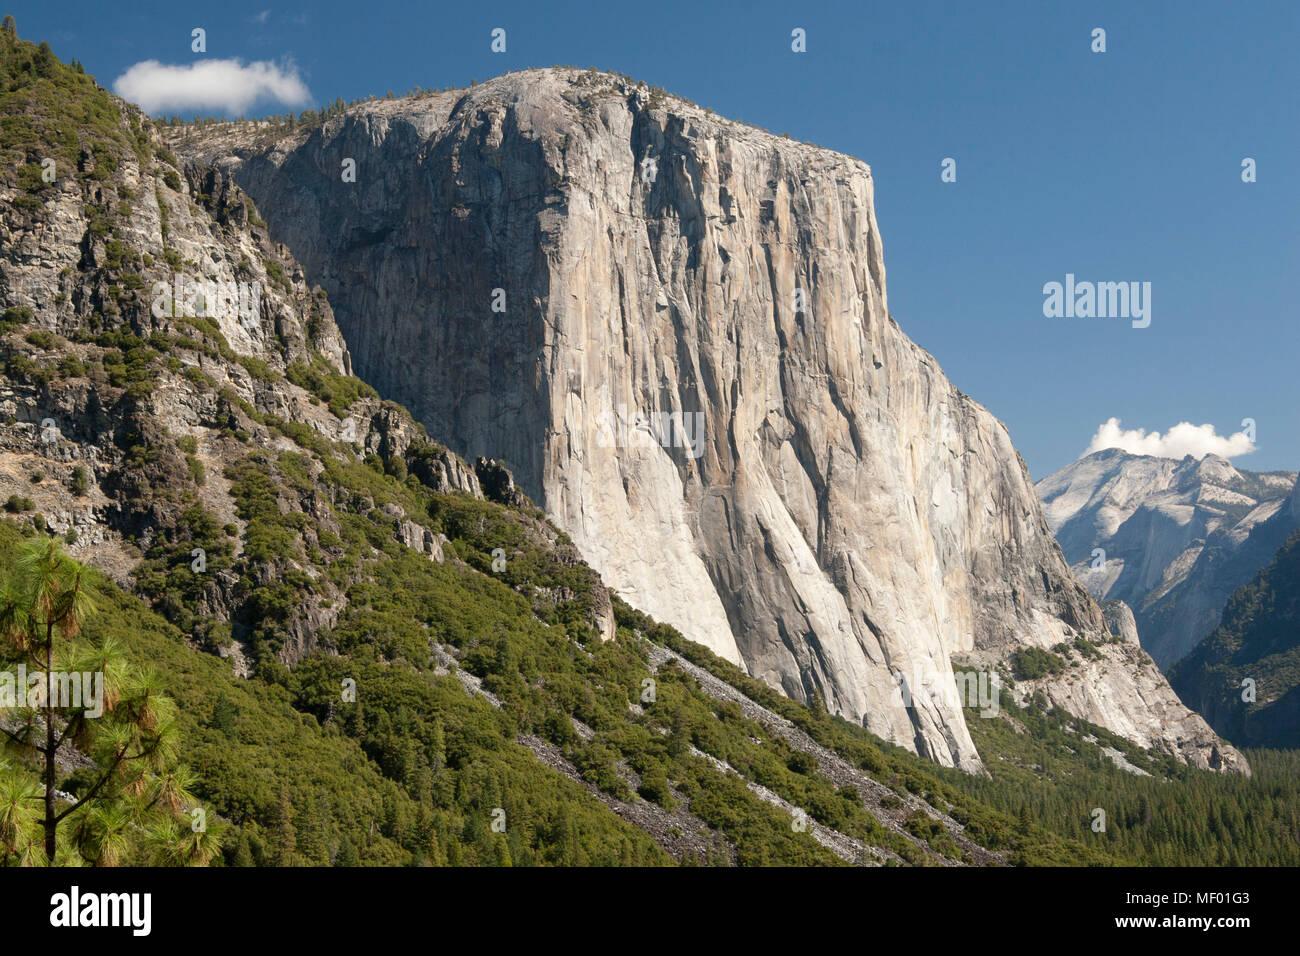 El Capitan in the Yosemite Valley National Park, California, USA Stock Photo